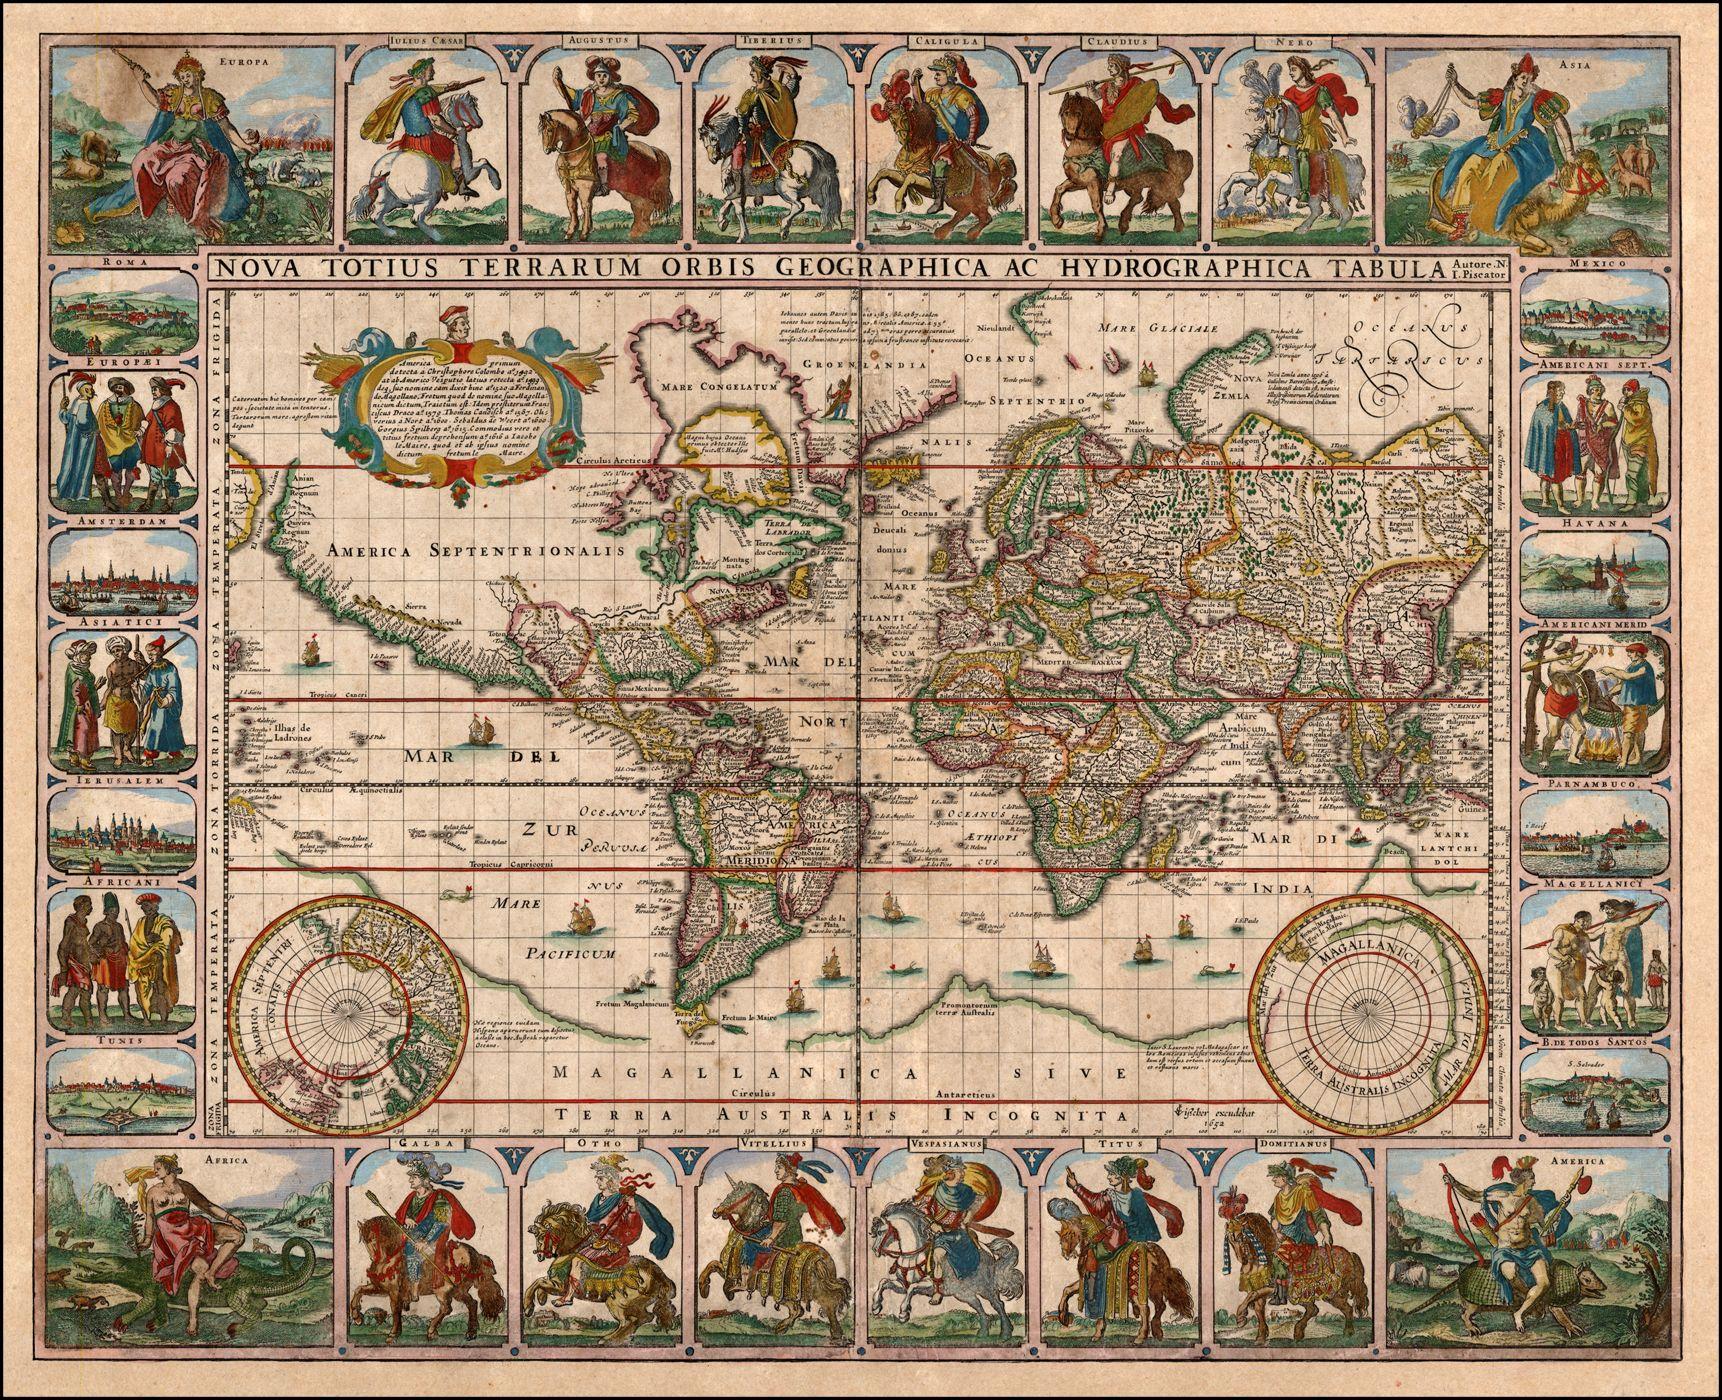 mapamundis antiguos - Google Search | Mapas antiguos | Pinterest ...